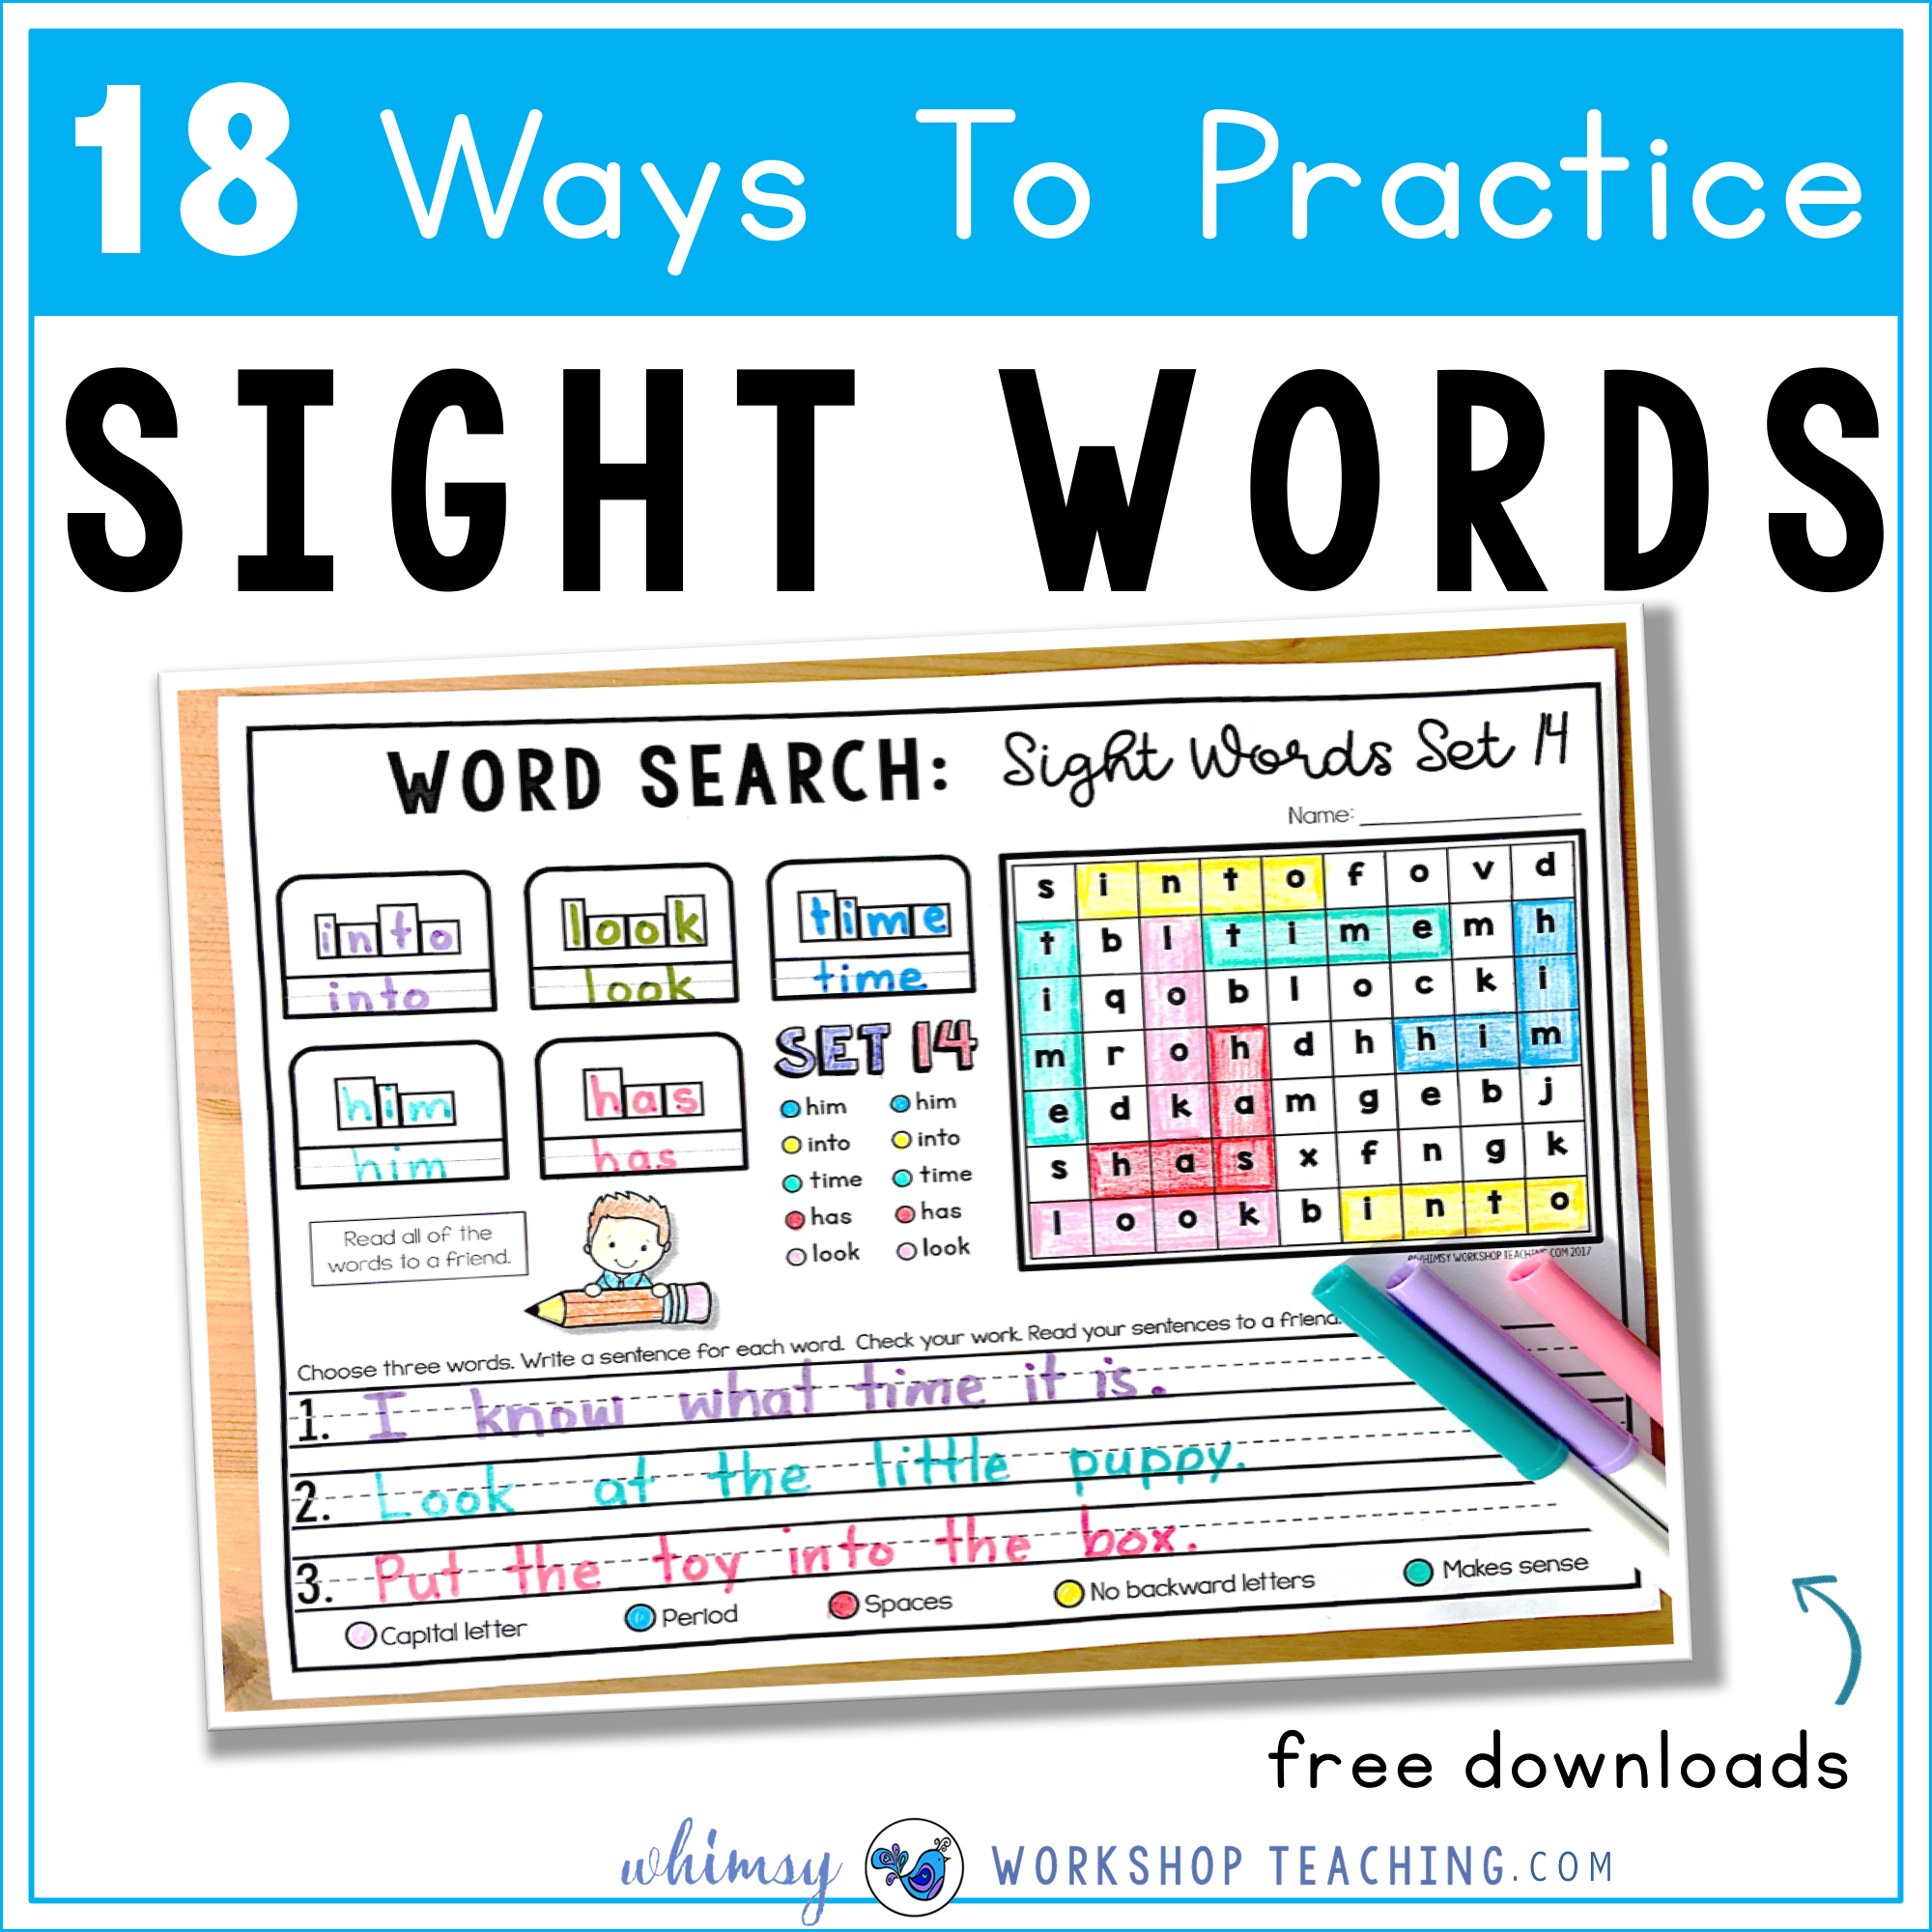 18 ways to practice sight words